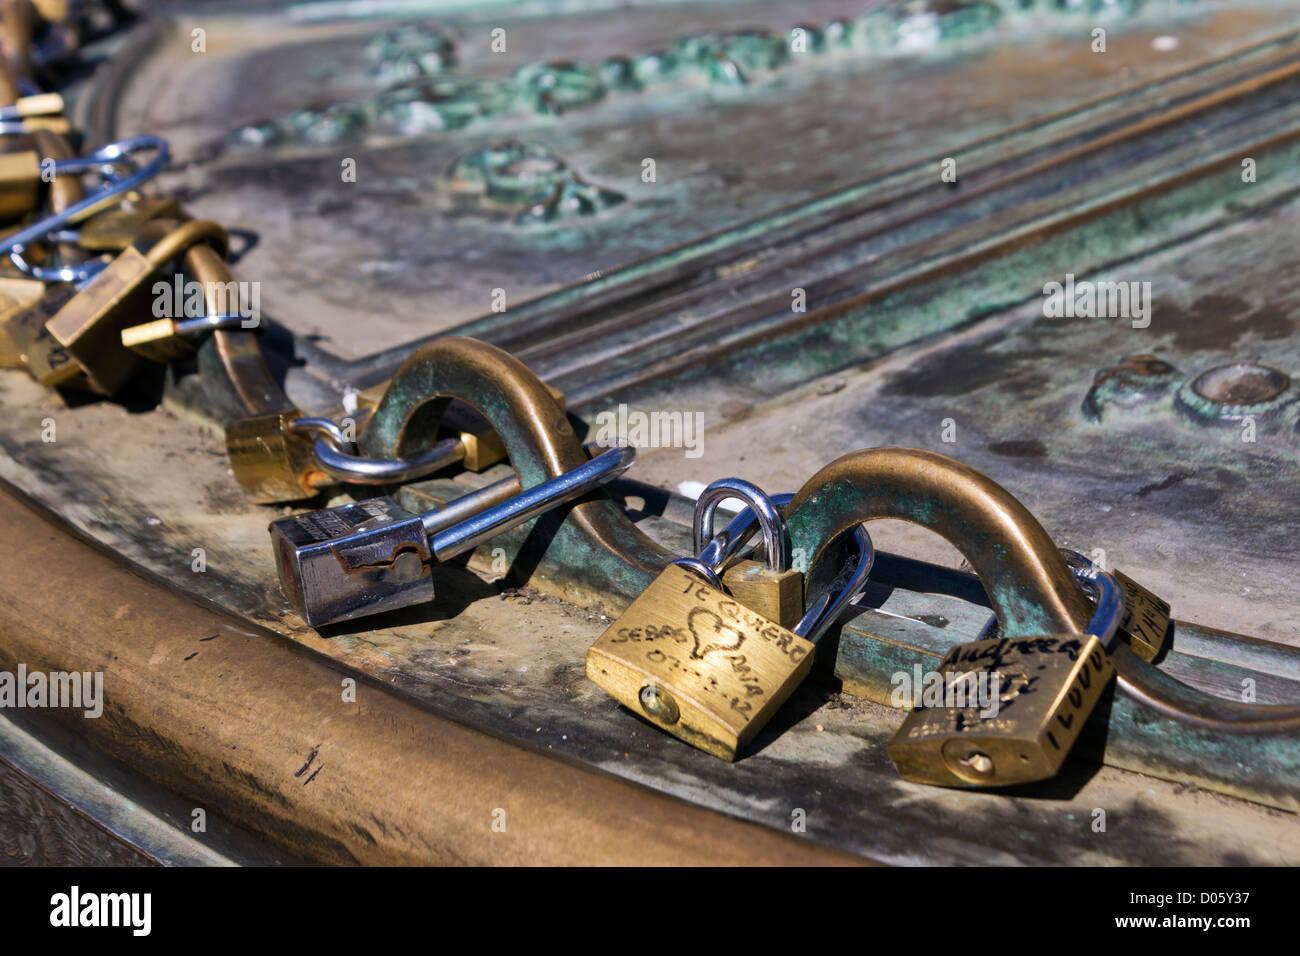 Plaza Mayor, Madrid, Spain. Love Padlocks. Couples write their names on padlocks to symbolize undying love. - Stock Image